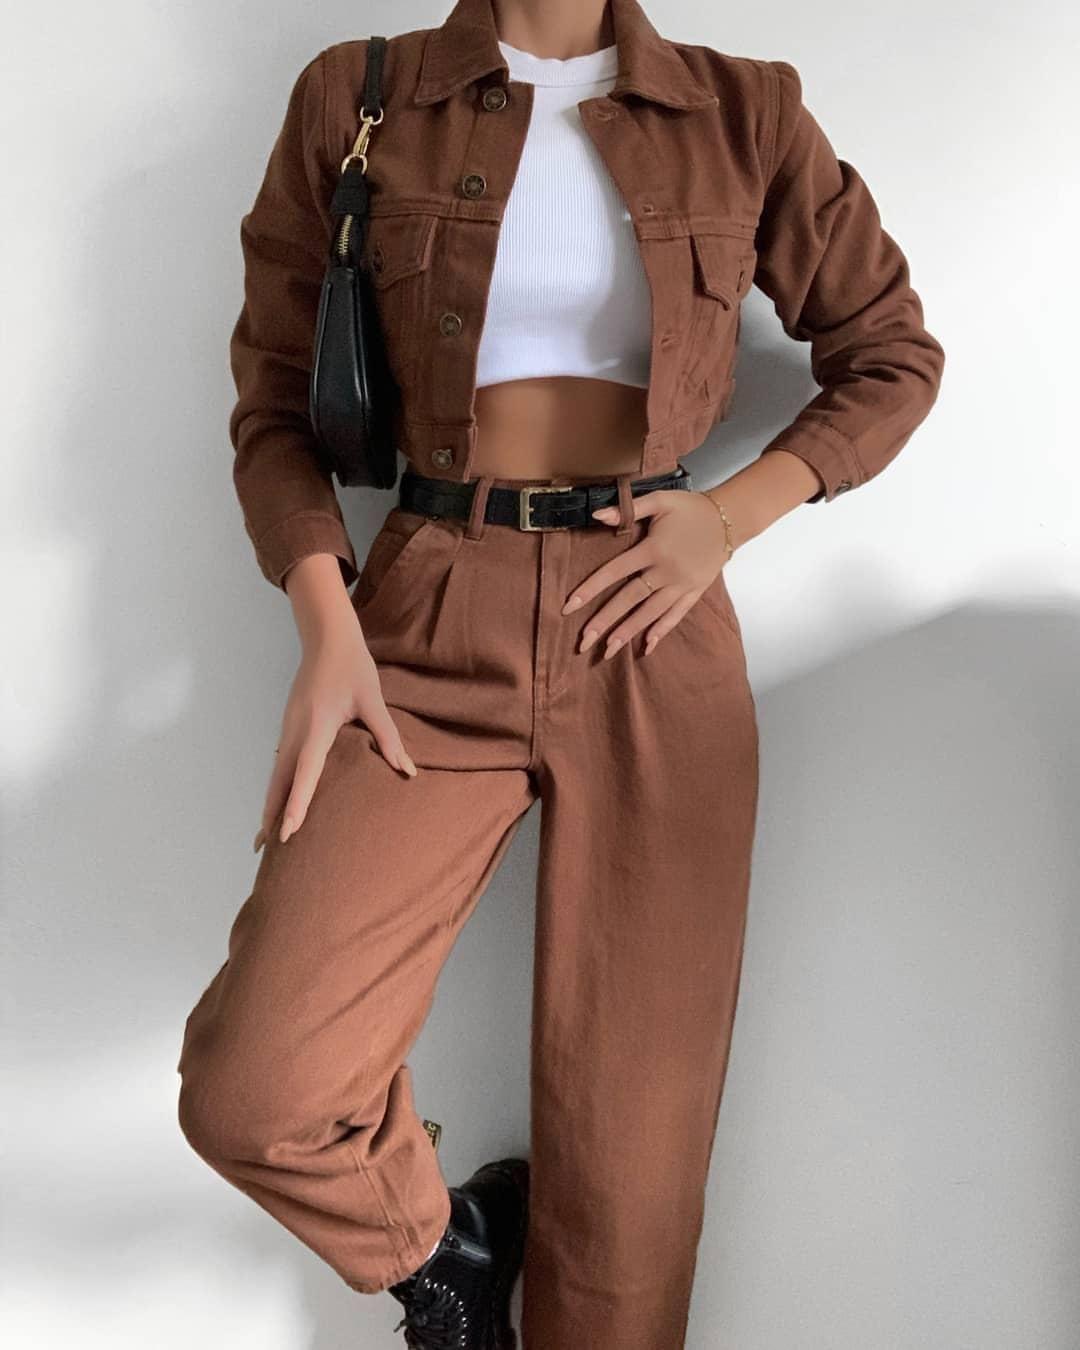 Jacket, A$69 at showpo.com - Wheretoget